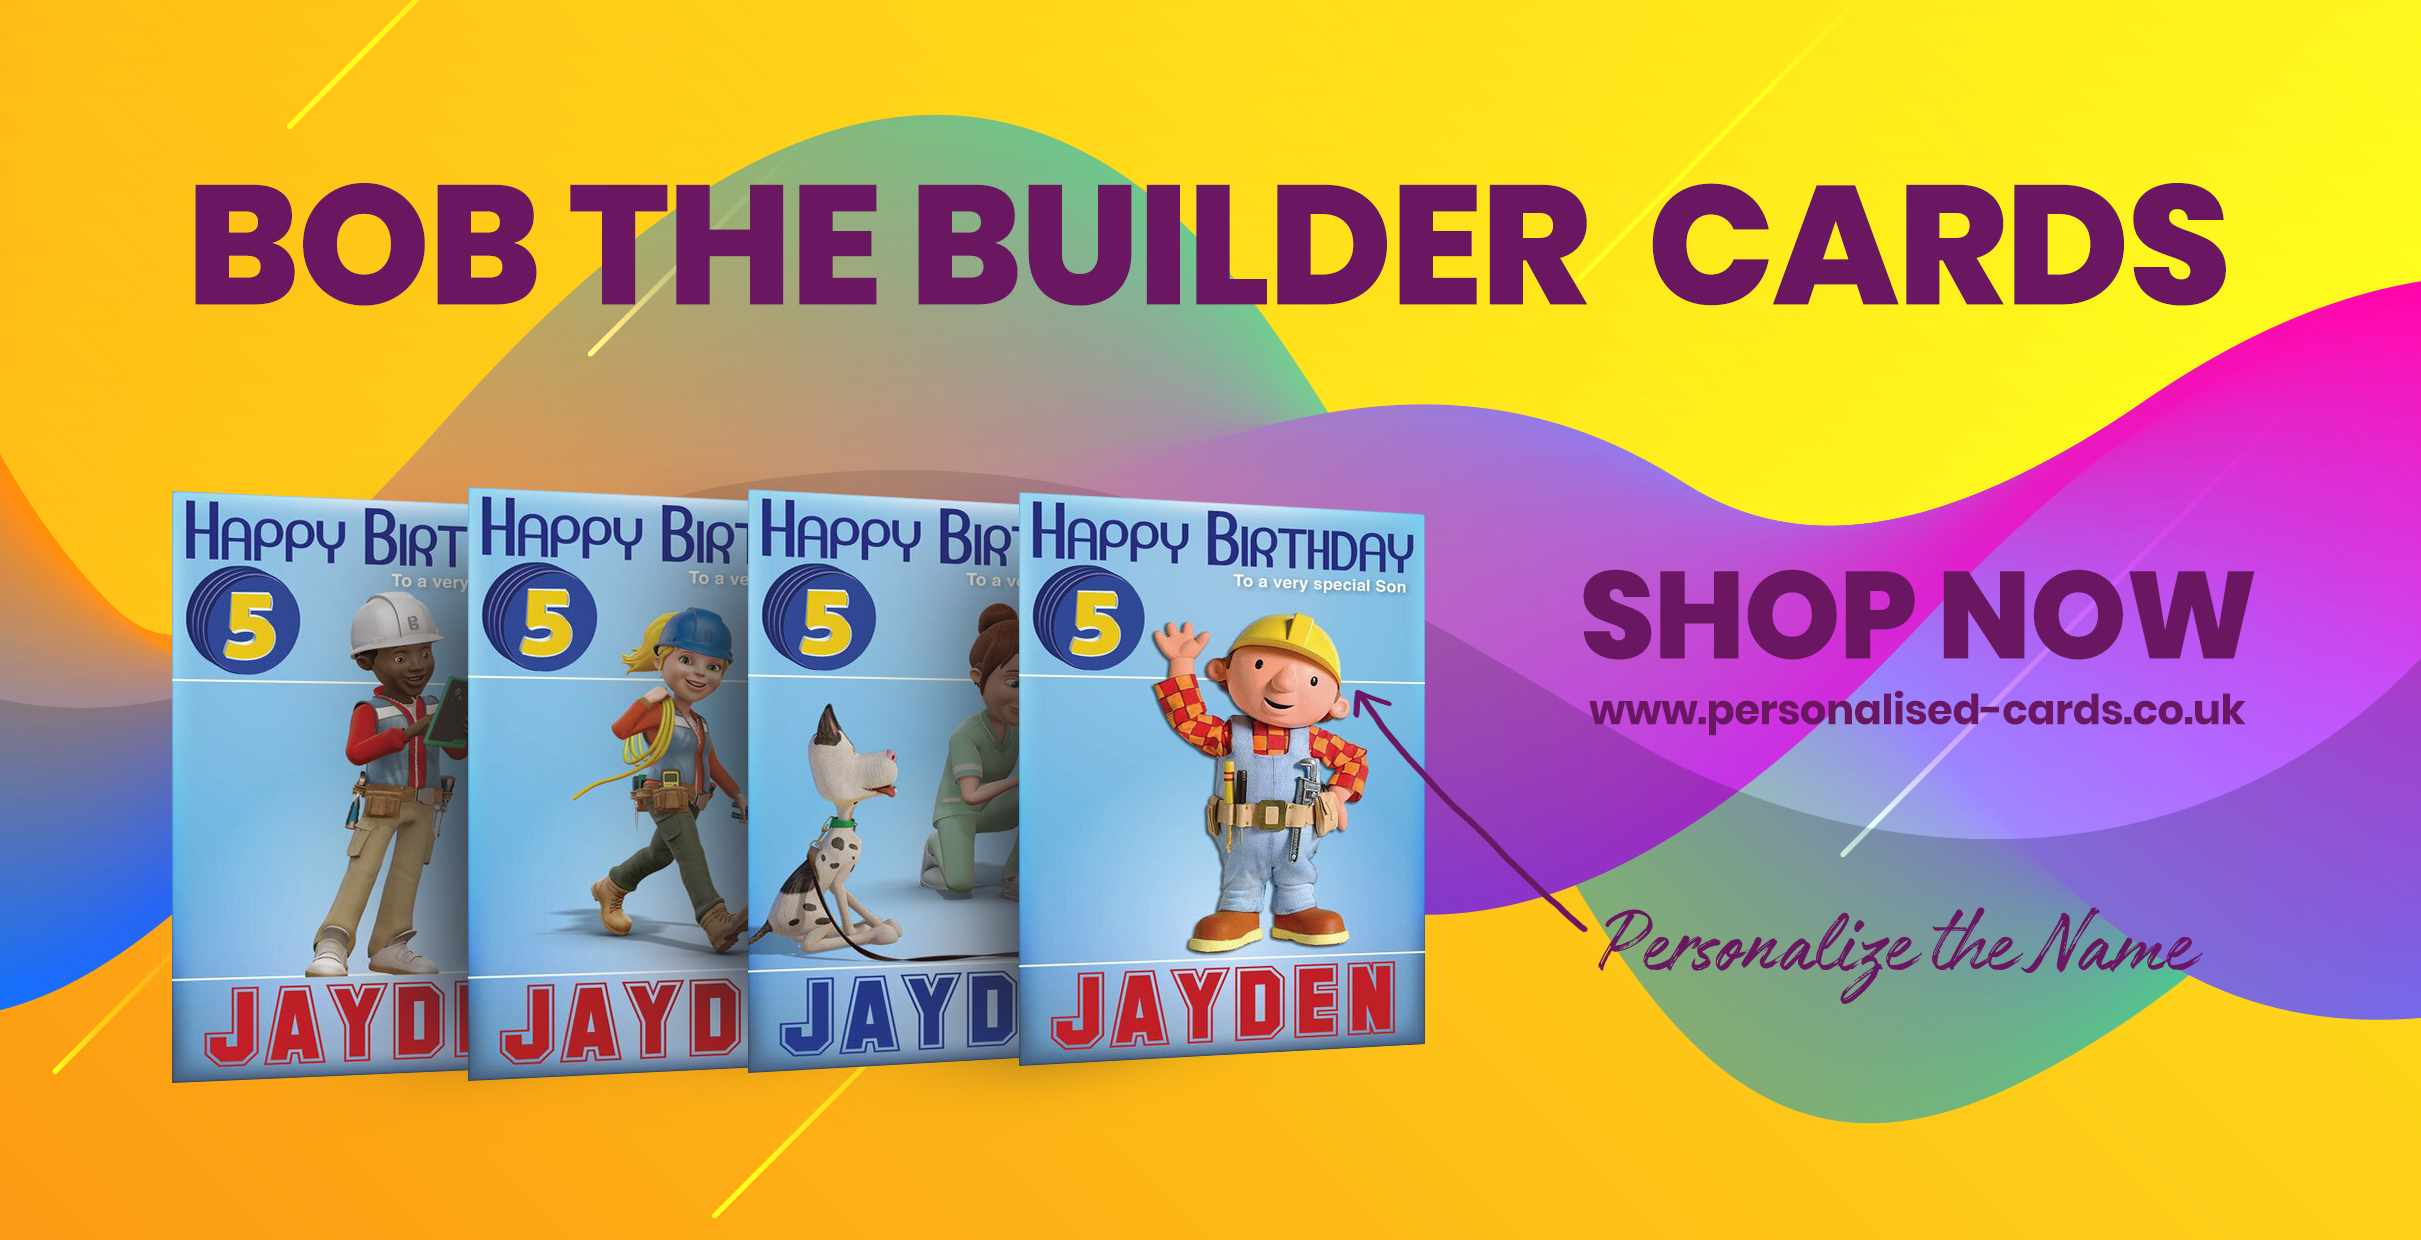 bob-the-builder-cards.jpg